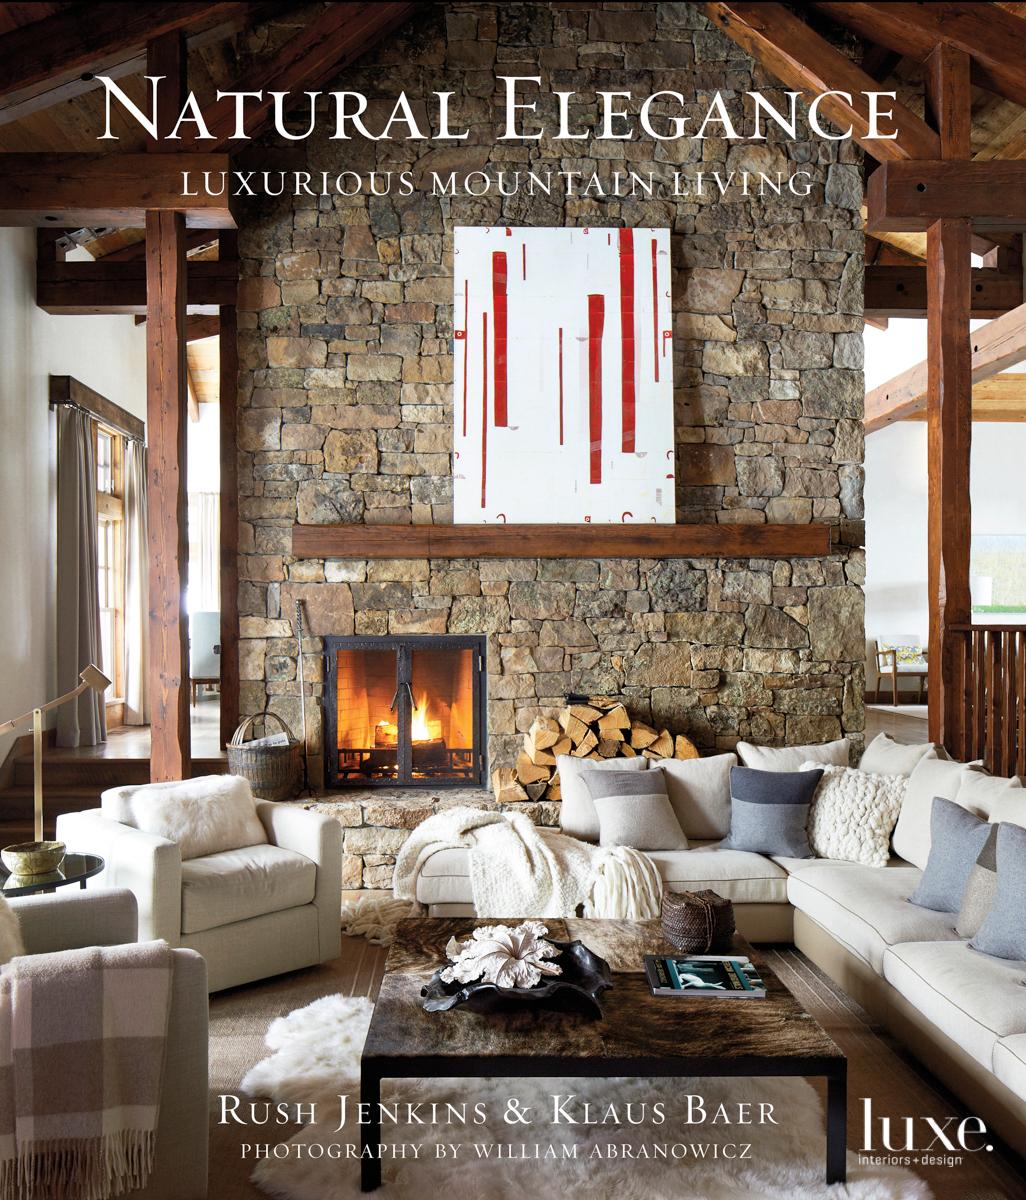 natural elegance book cover